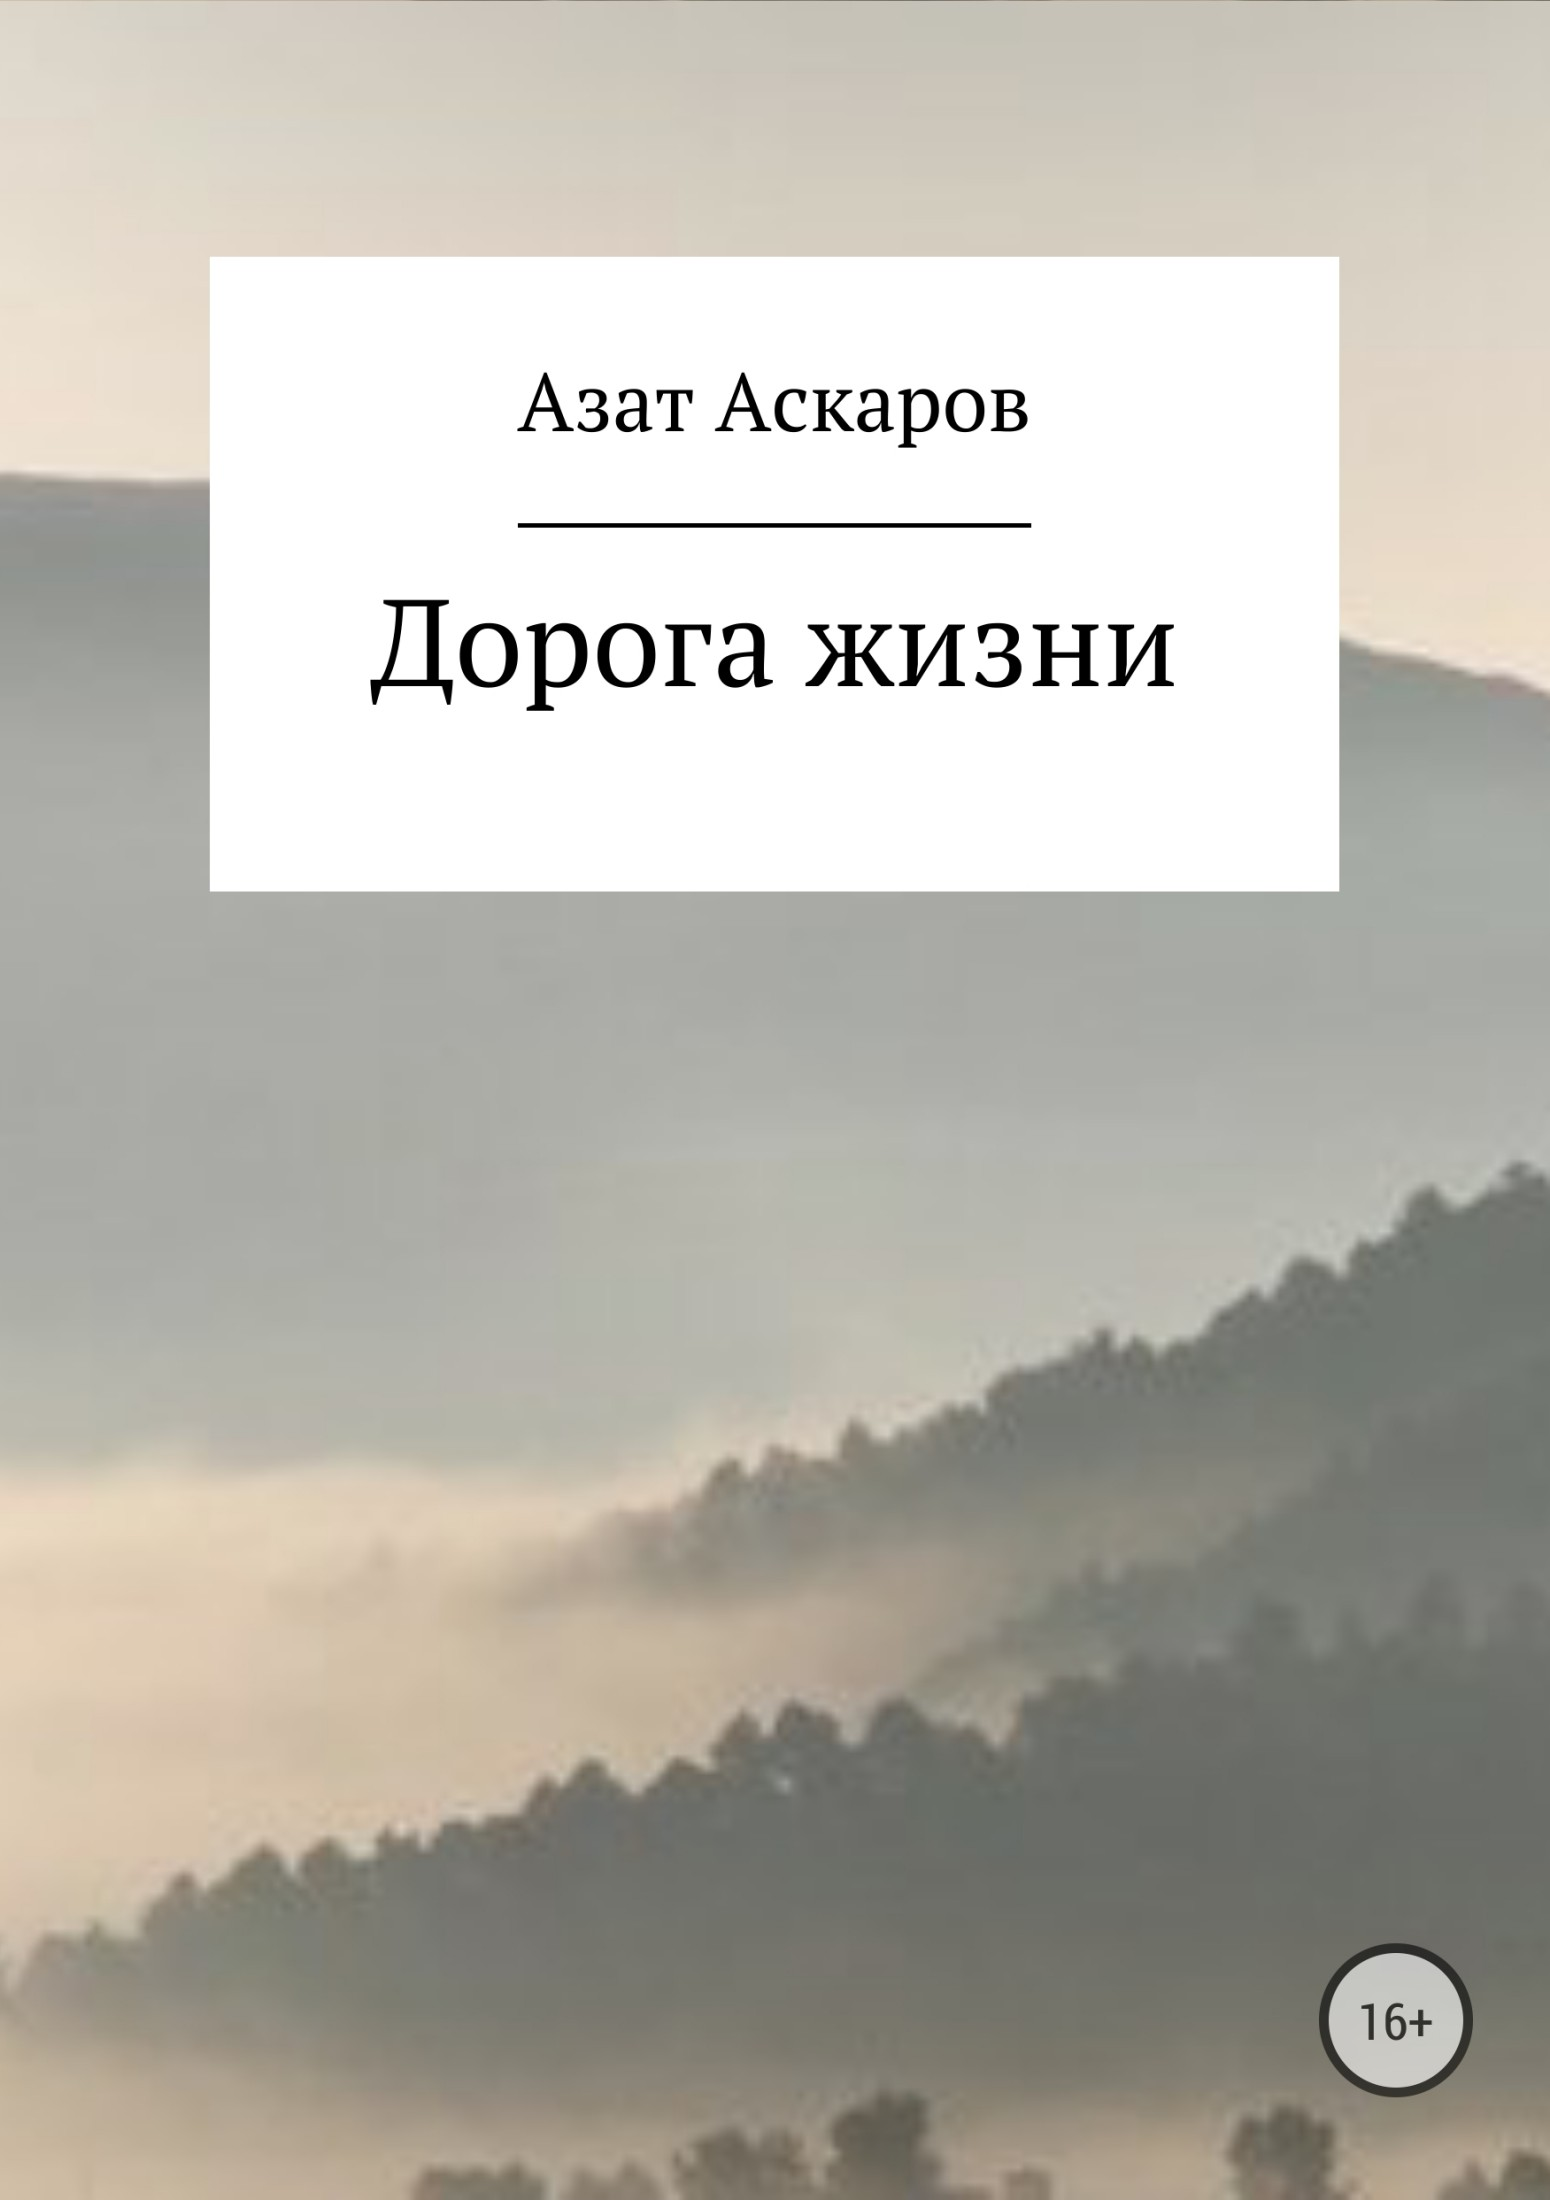 Азат Аскаров Дорога жизни. Сборник стихотворений дорога в будущее